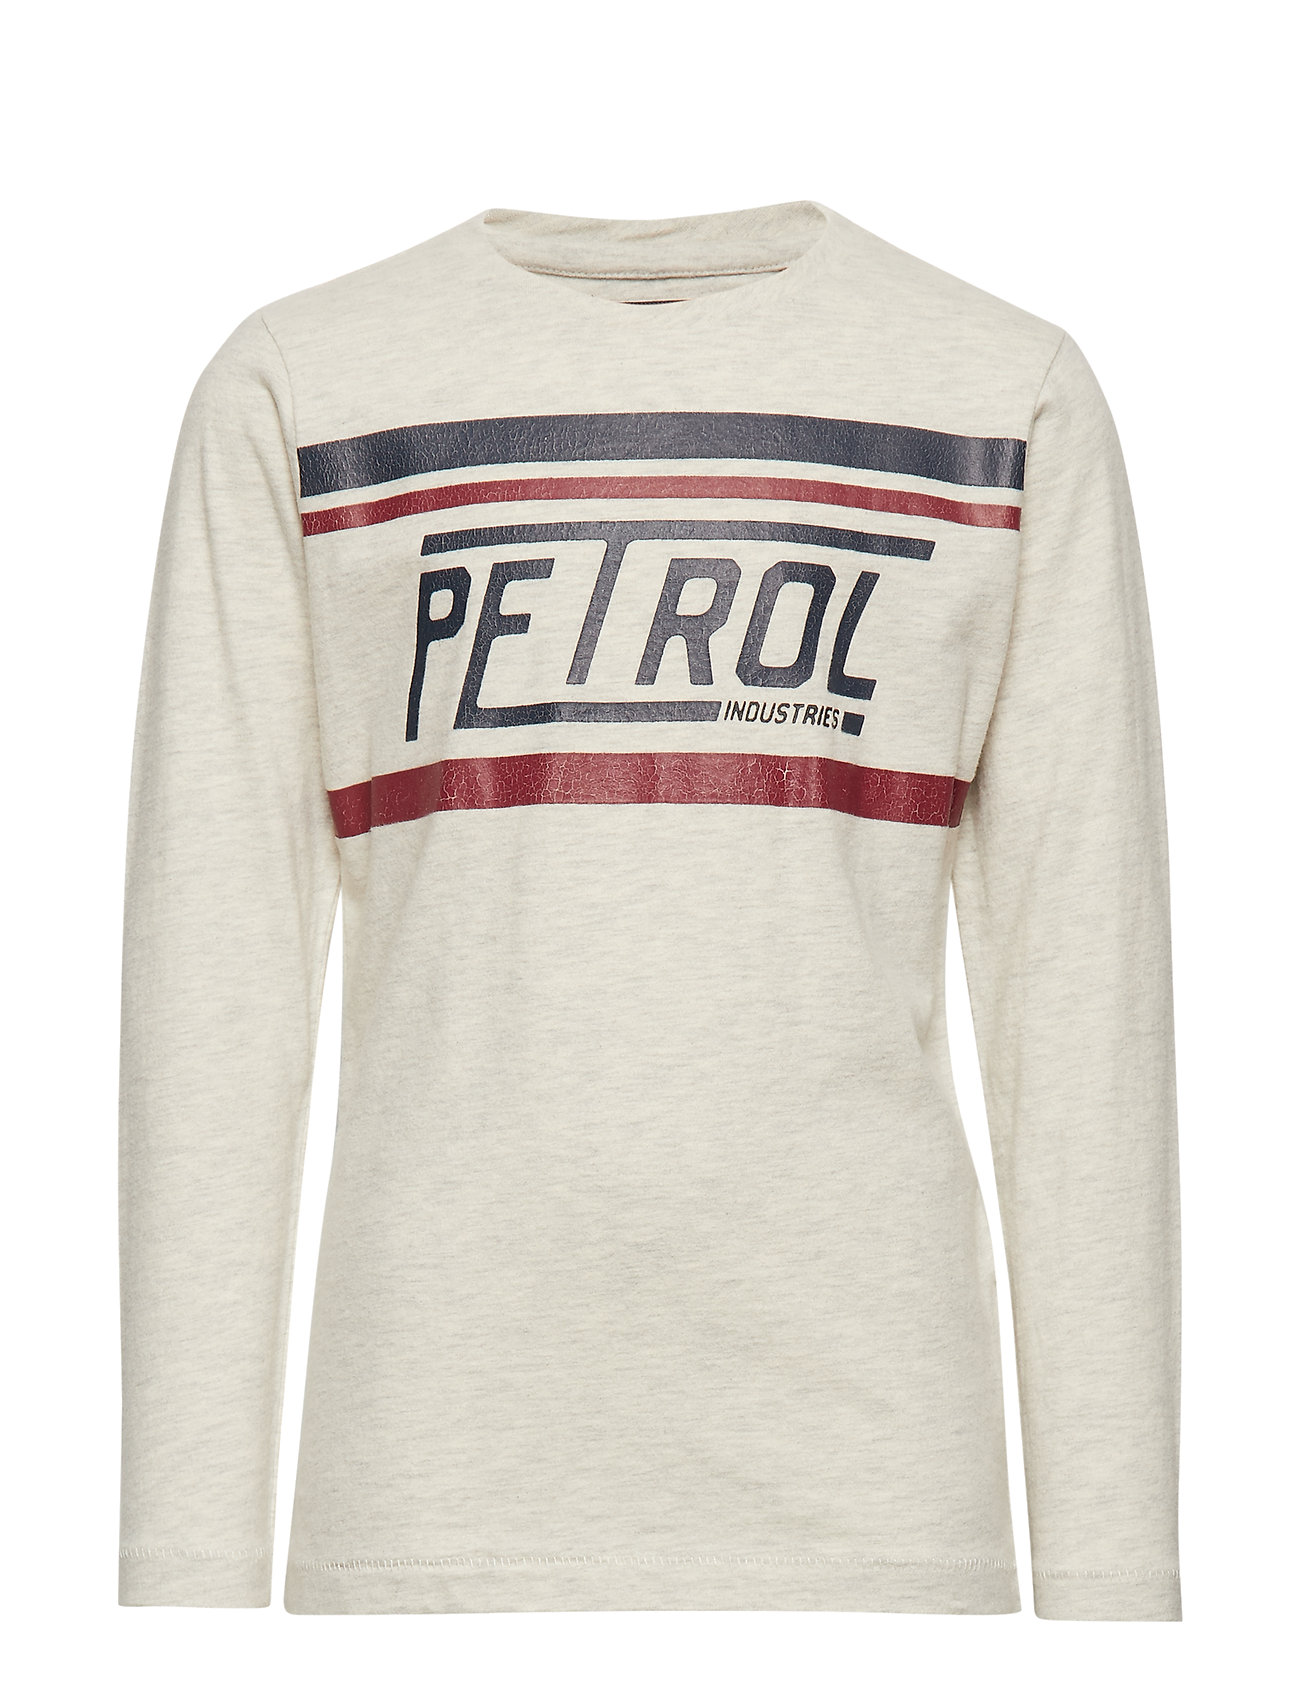 Petrol T-Shirt LS R-Neck - ANTIQUE WHITE MELEE